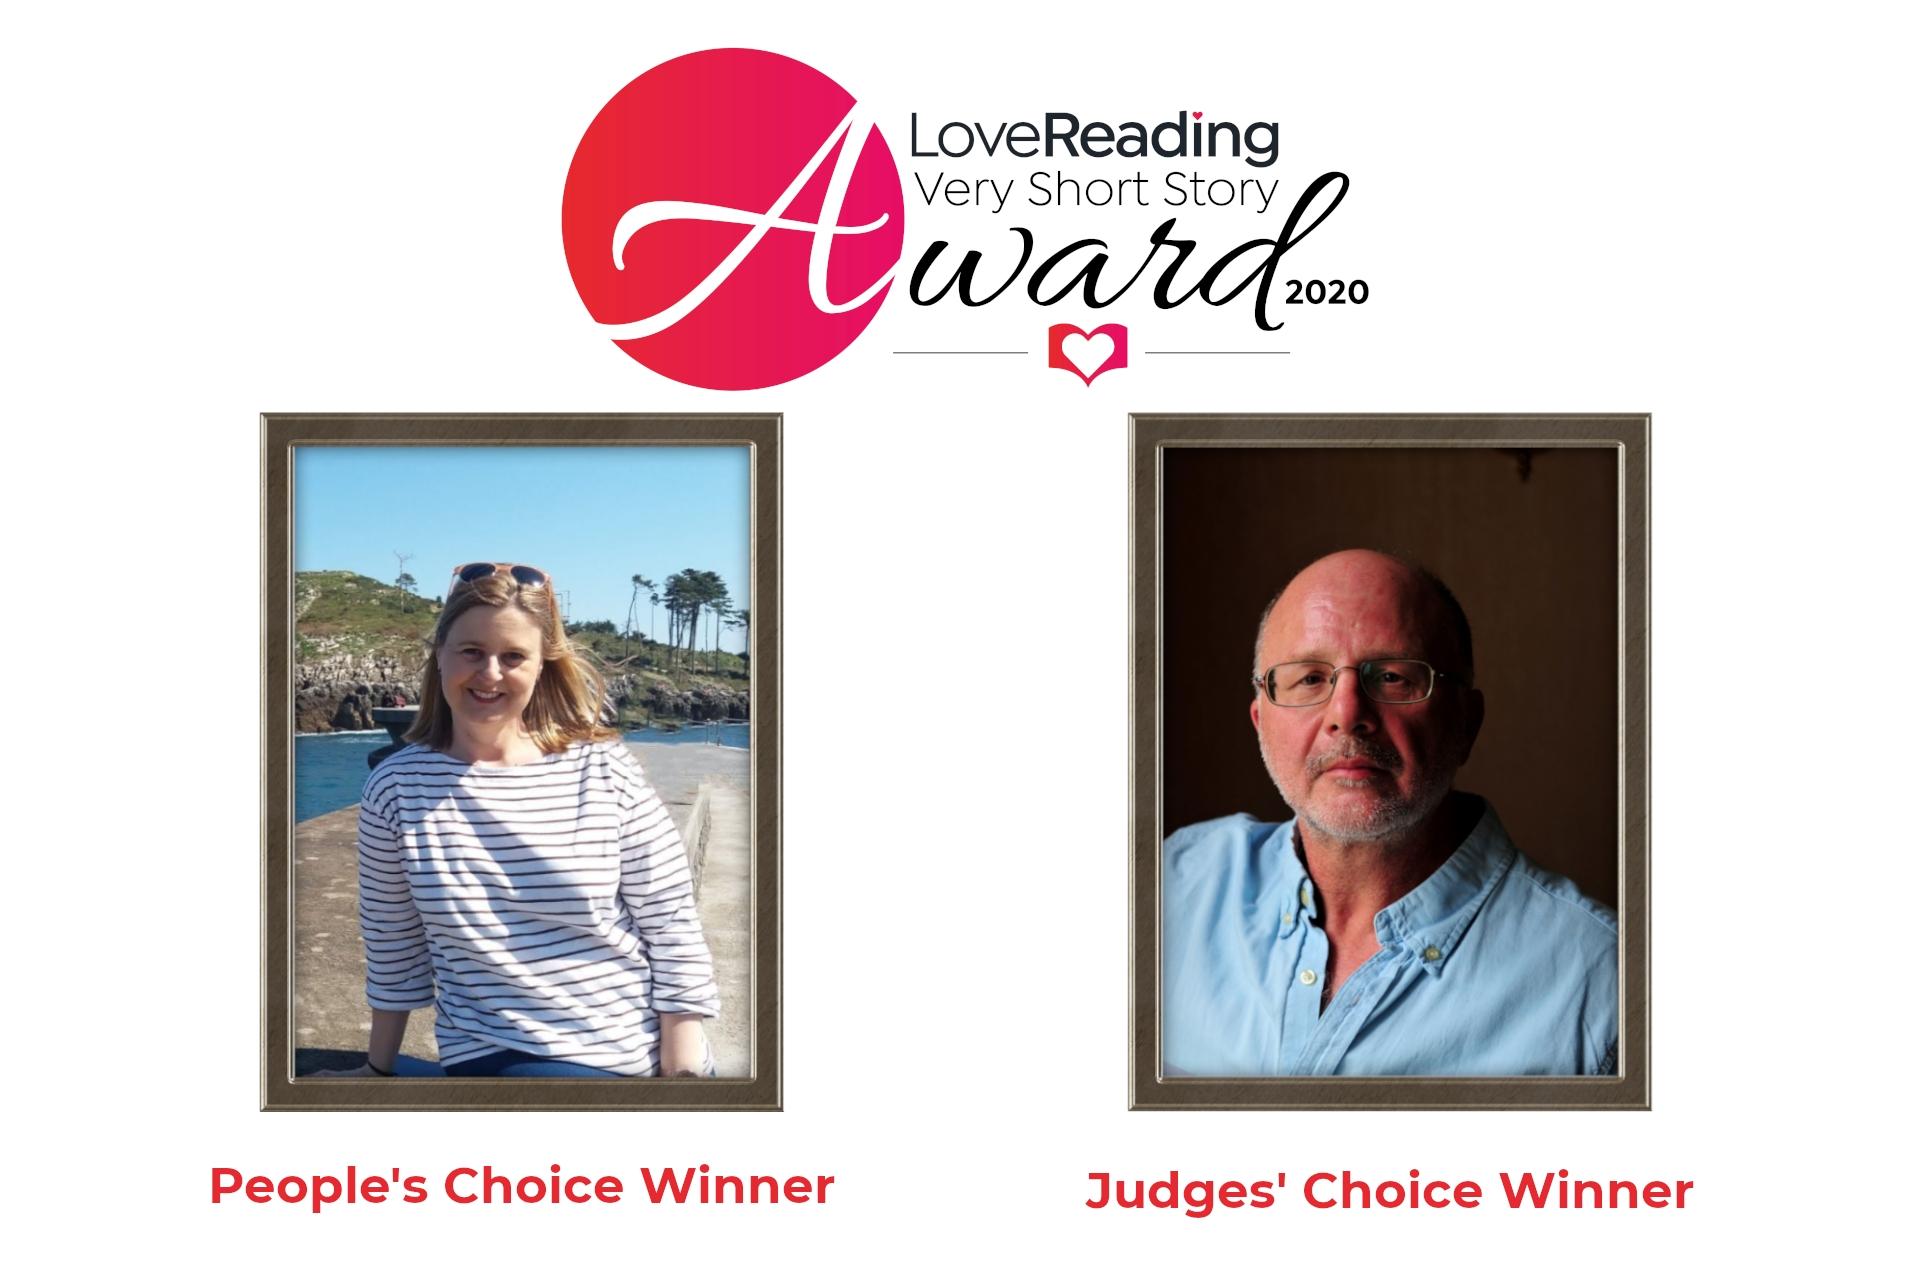 The LoveReading Very Short Story Awards 2020 Winners!